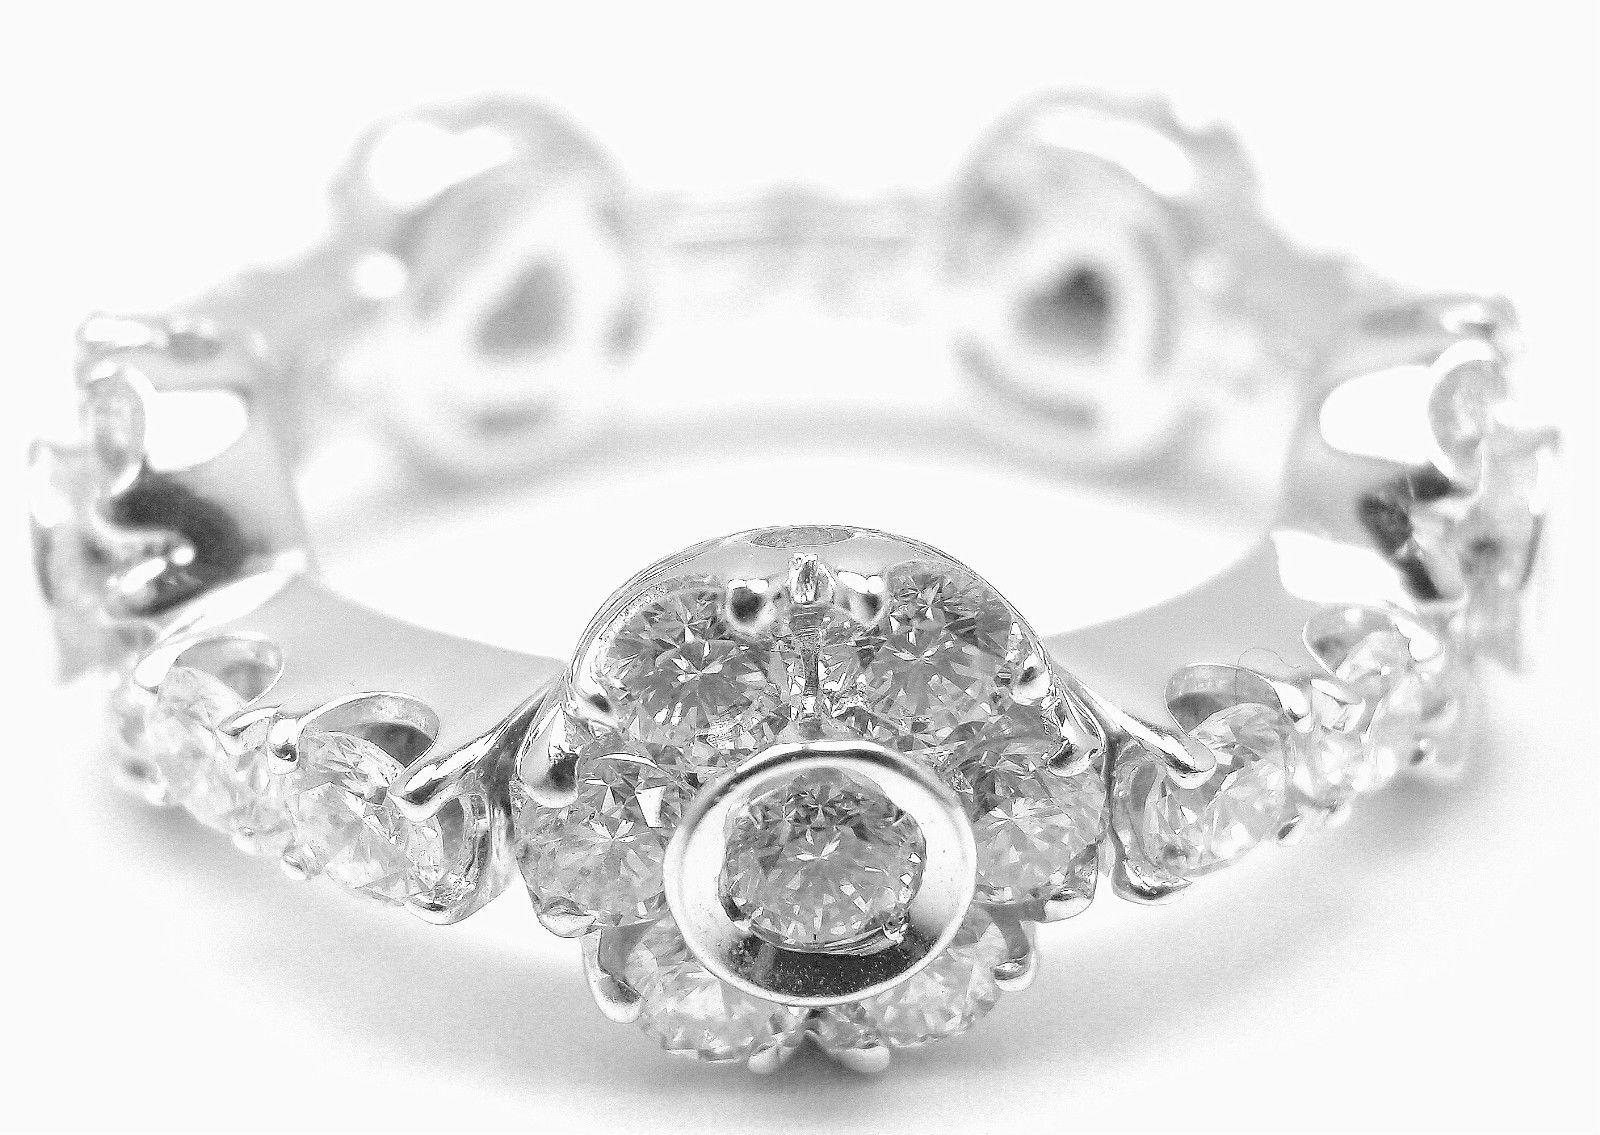 """""Pasquale Bruni 18k White Gold Diamond Flowers & Bars Ring"""""" 169649"